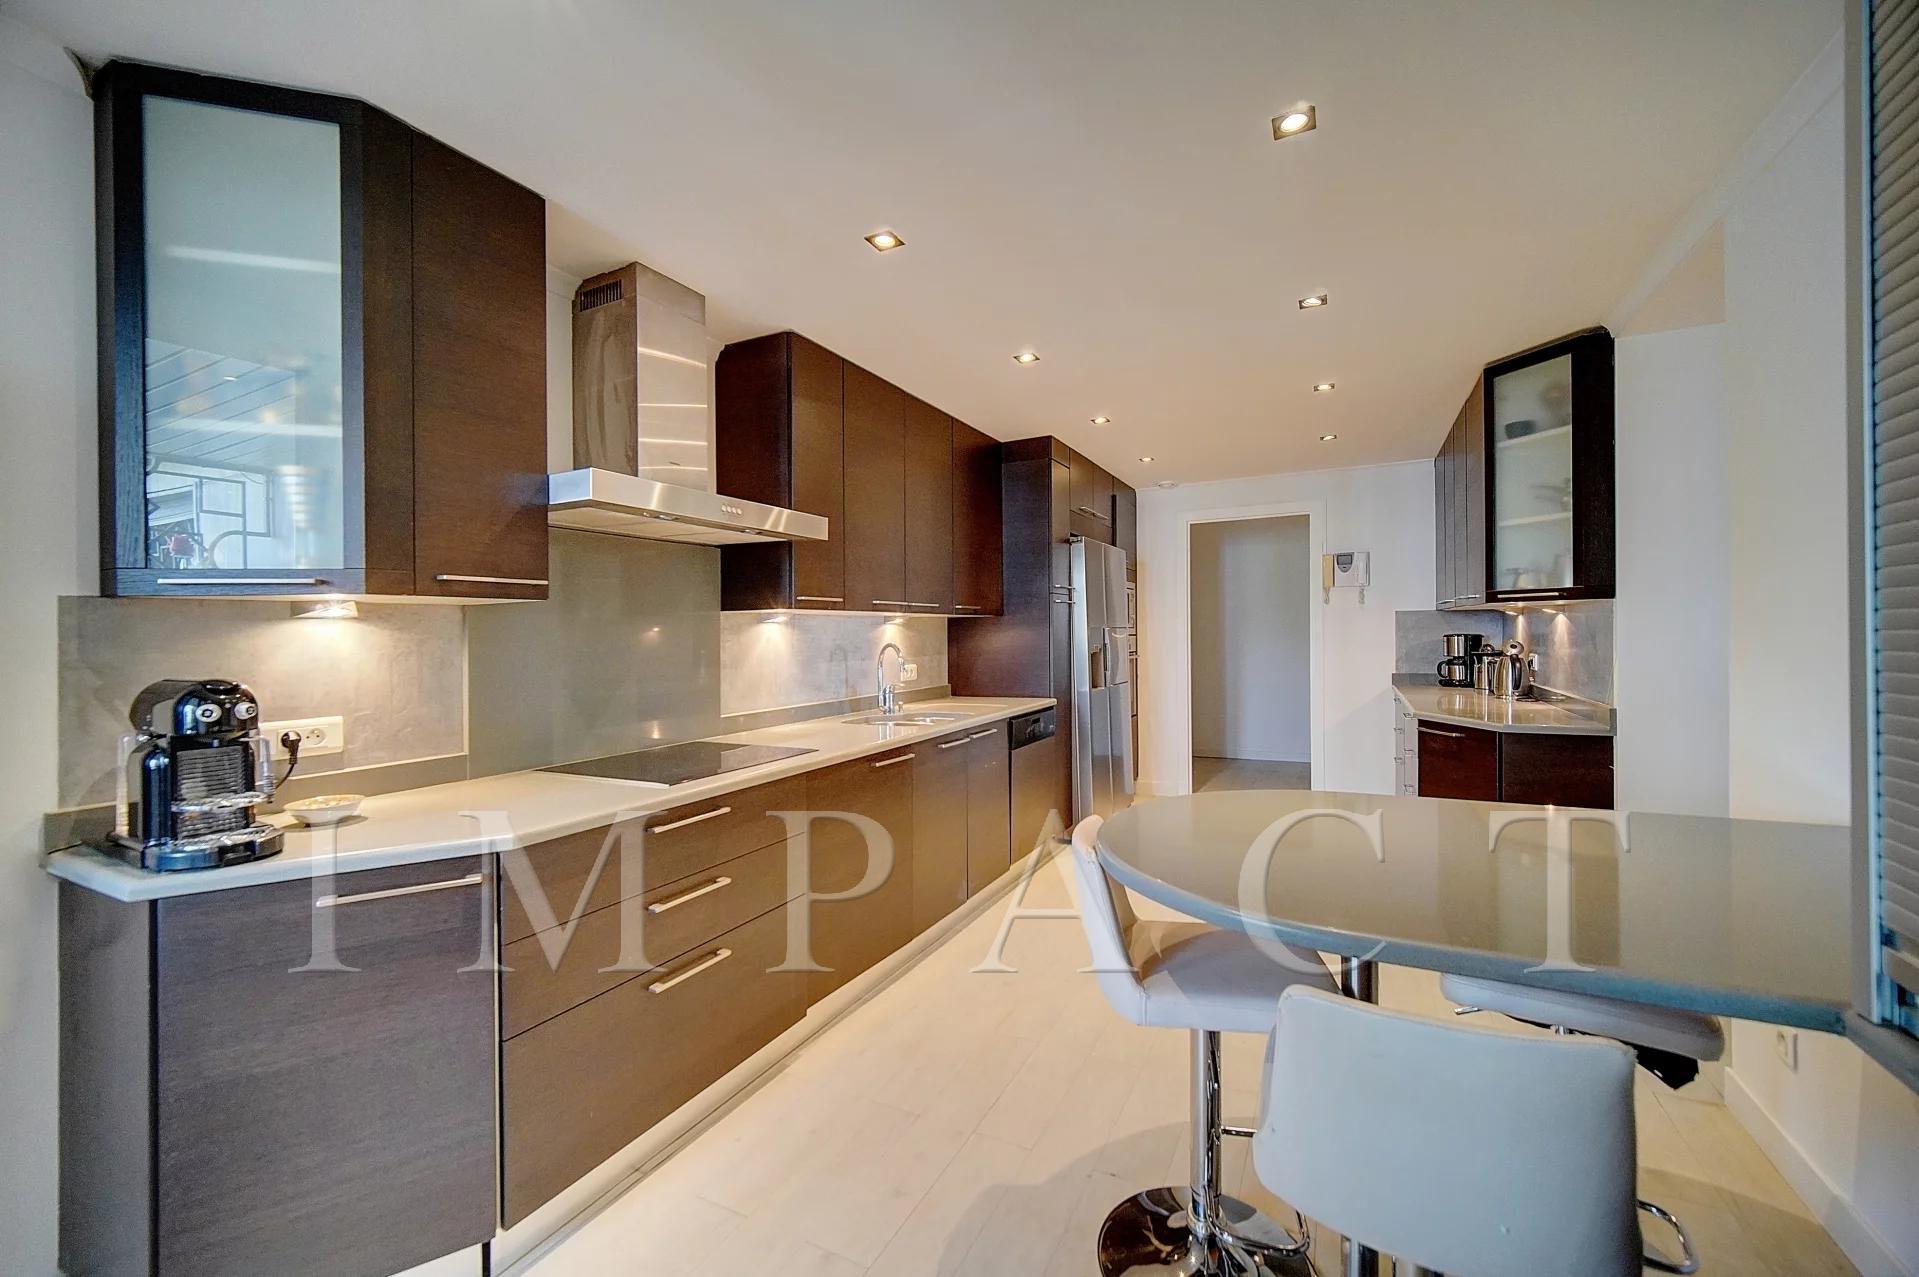 Seasonal rental Apartment - Cannes